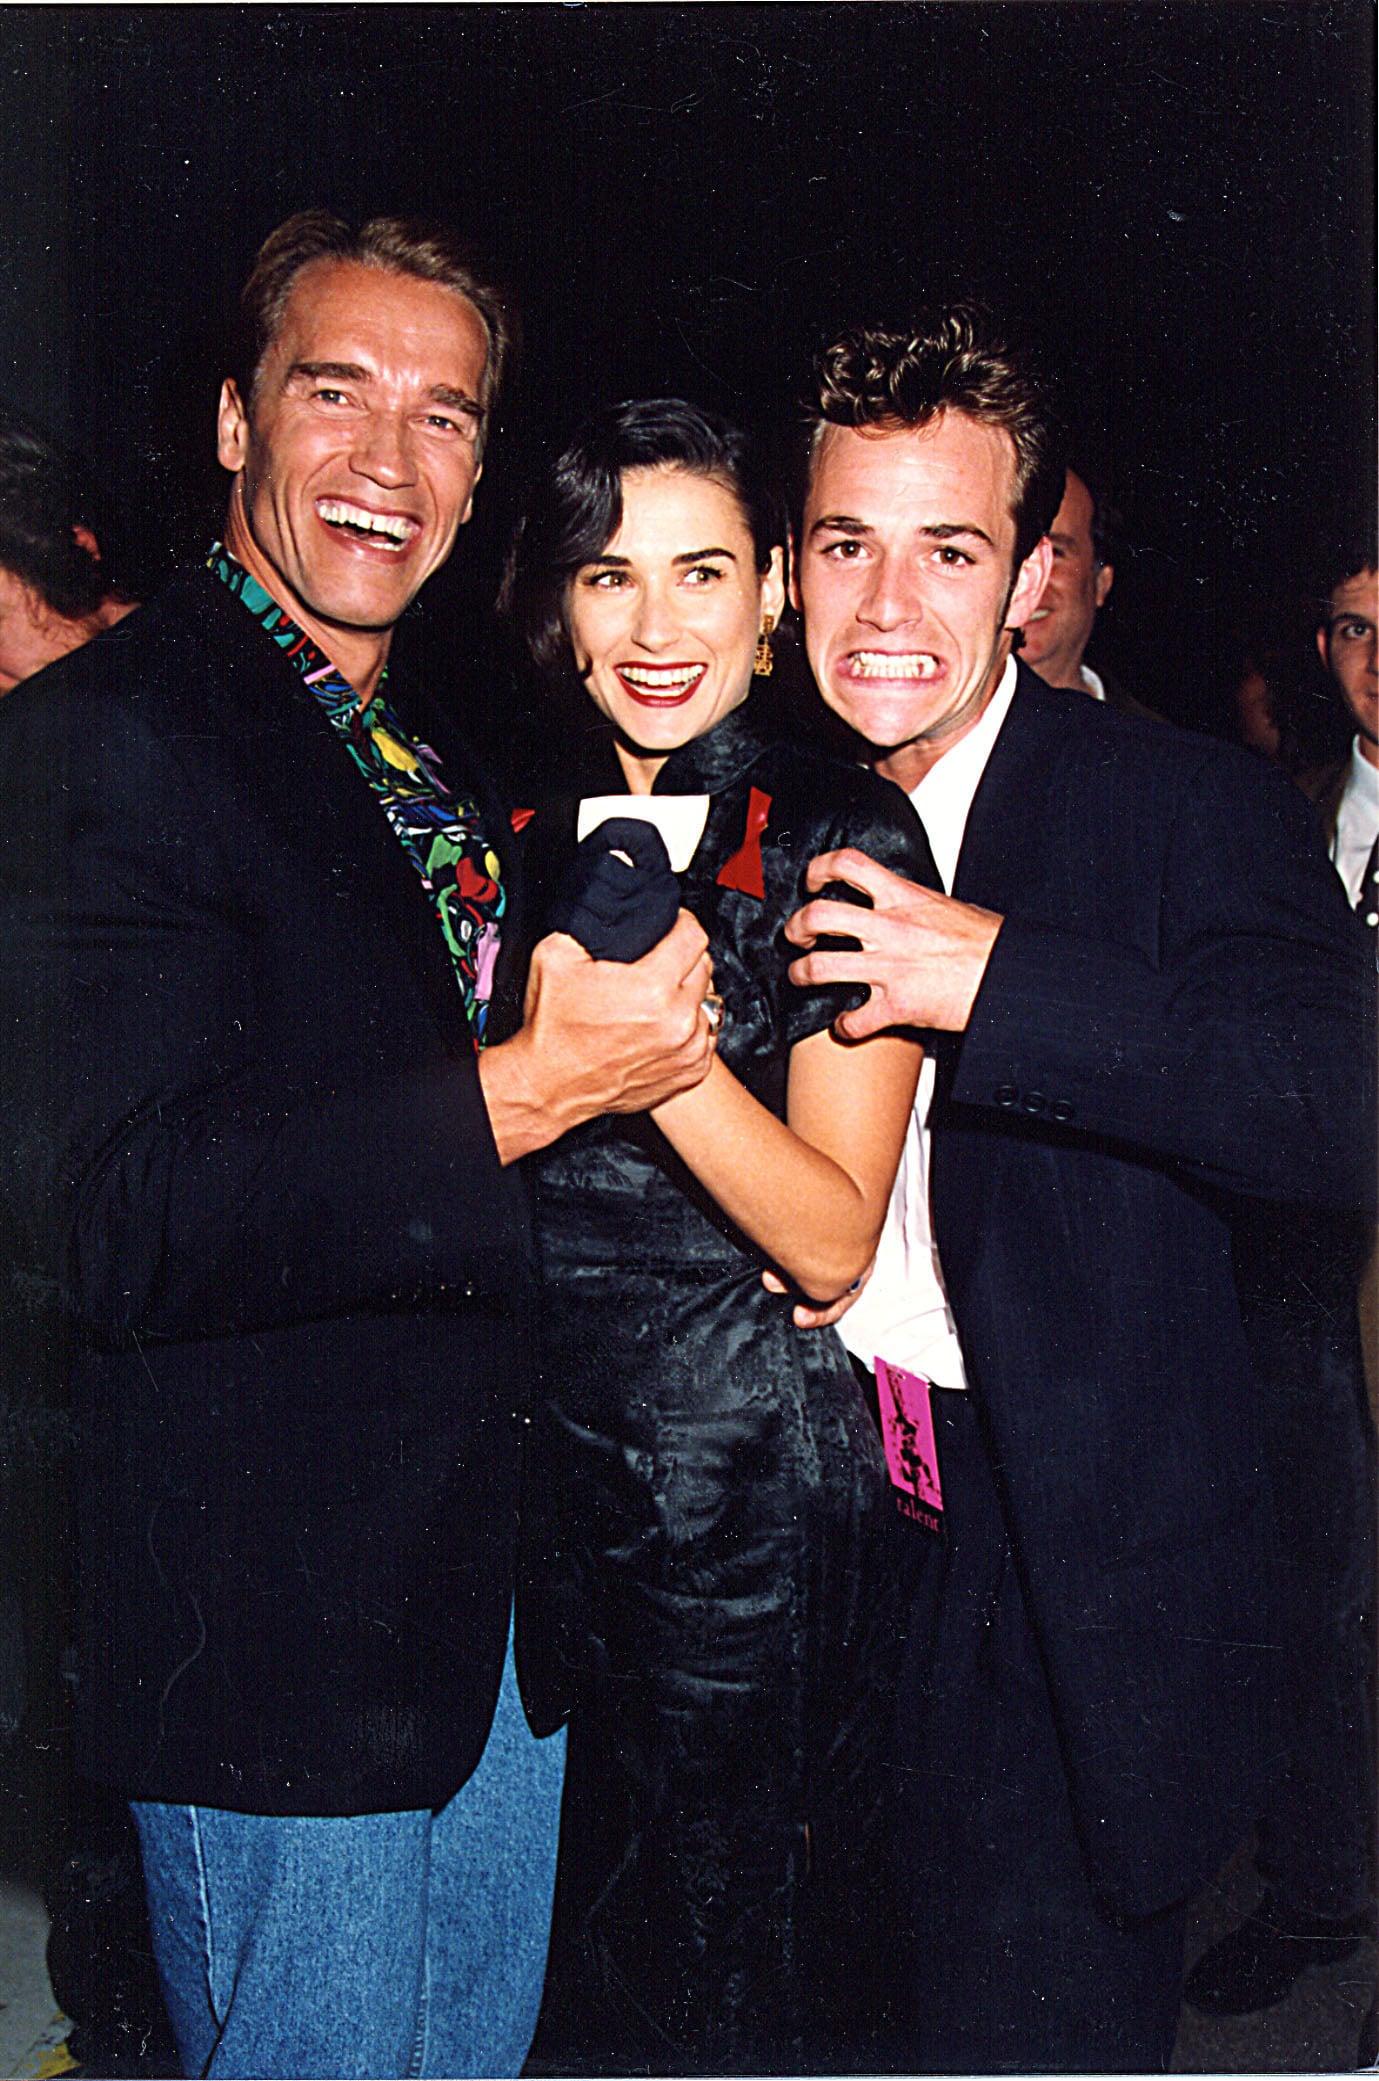 Luke Perry and Arnold Schwarzenegger were part of a Demi Moore sandwich.